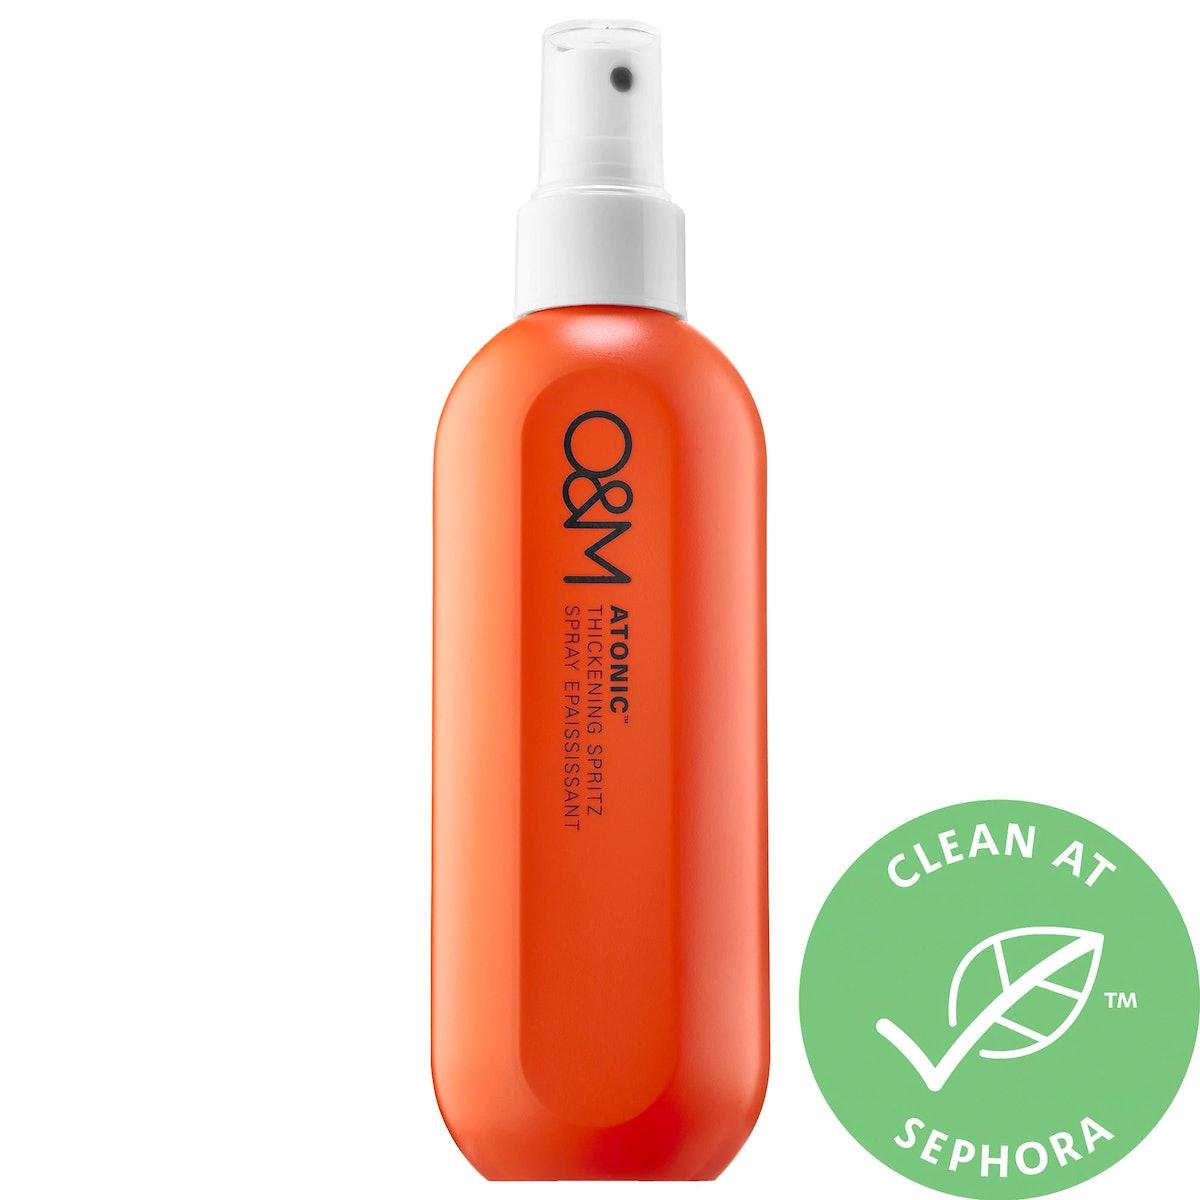 O&M Atonic™ Thickening Spritz